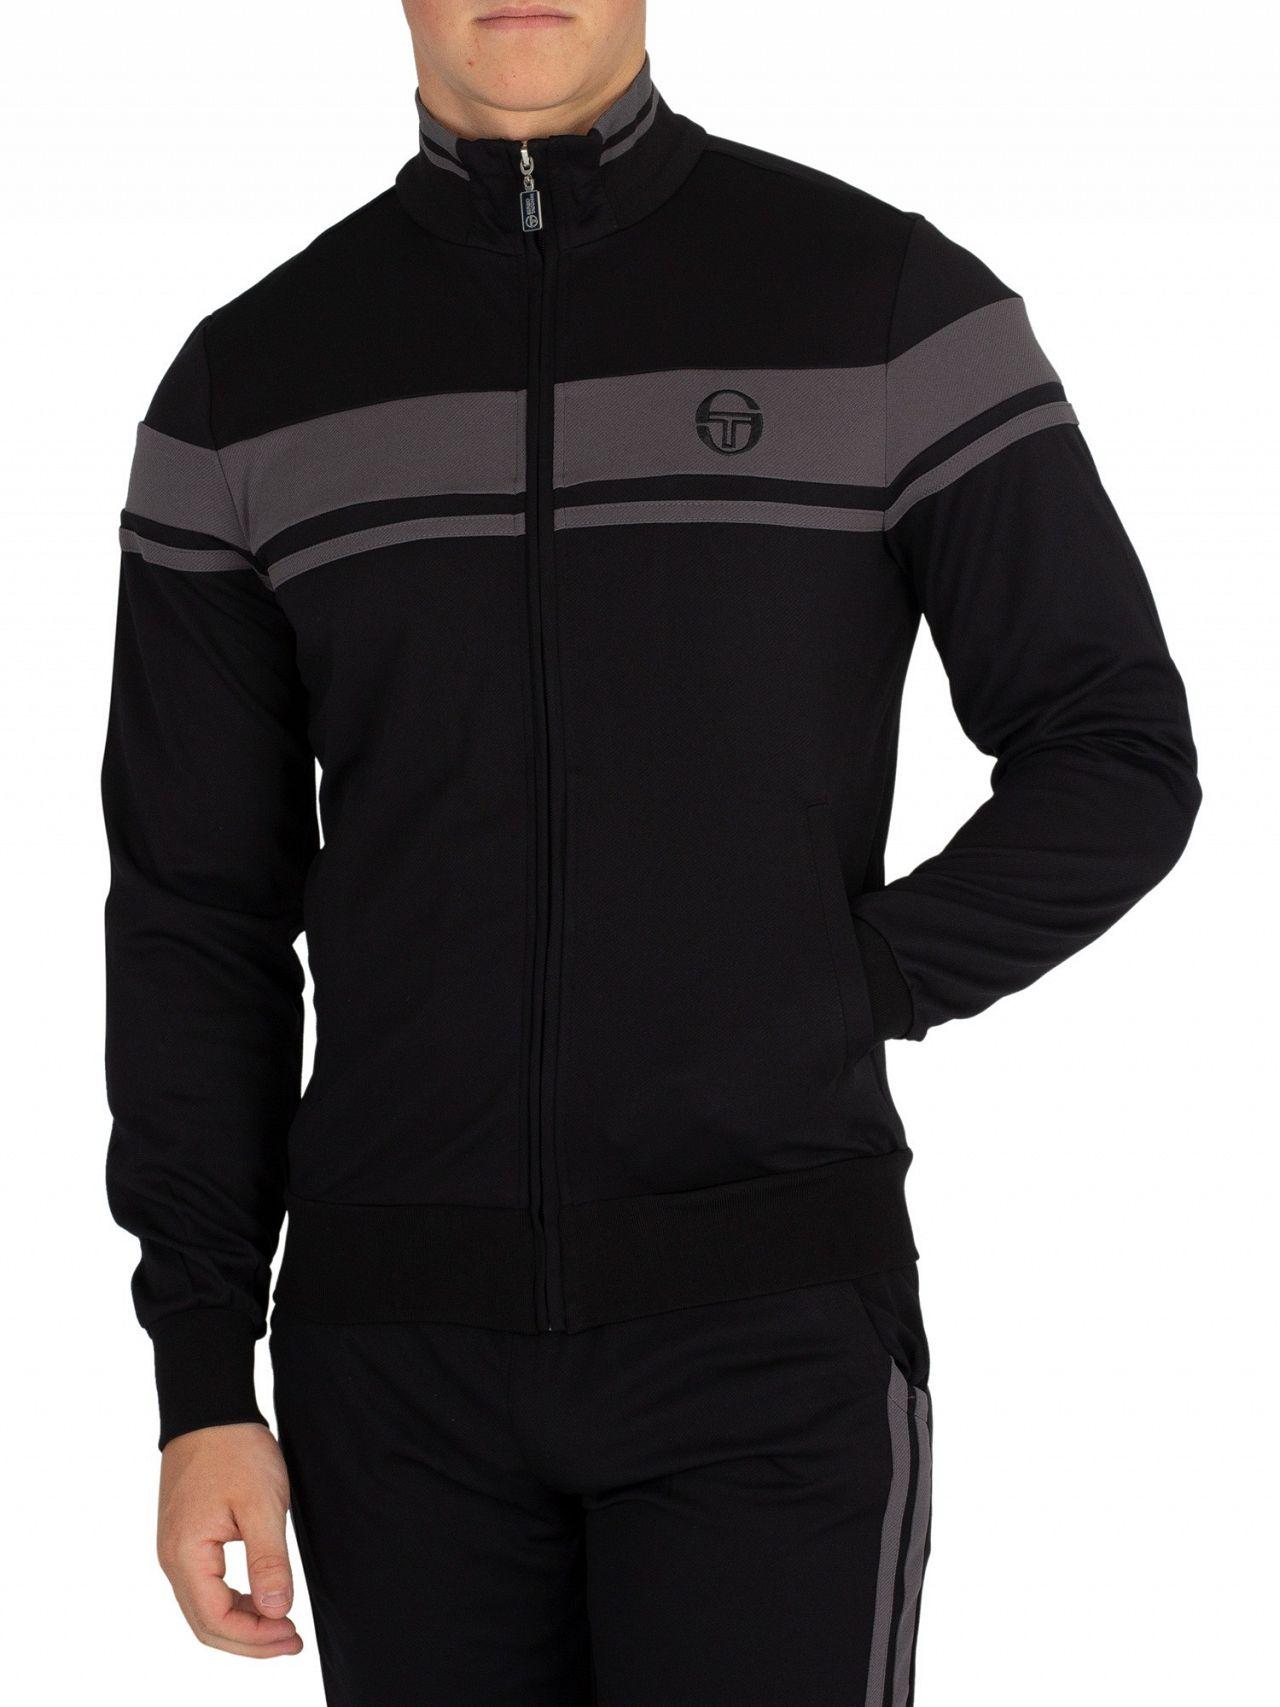 c164b354 Sergio Tacchini Black/Grey Damarindo Pinstripe Track Jacket | Standout